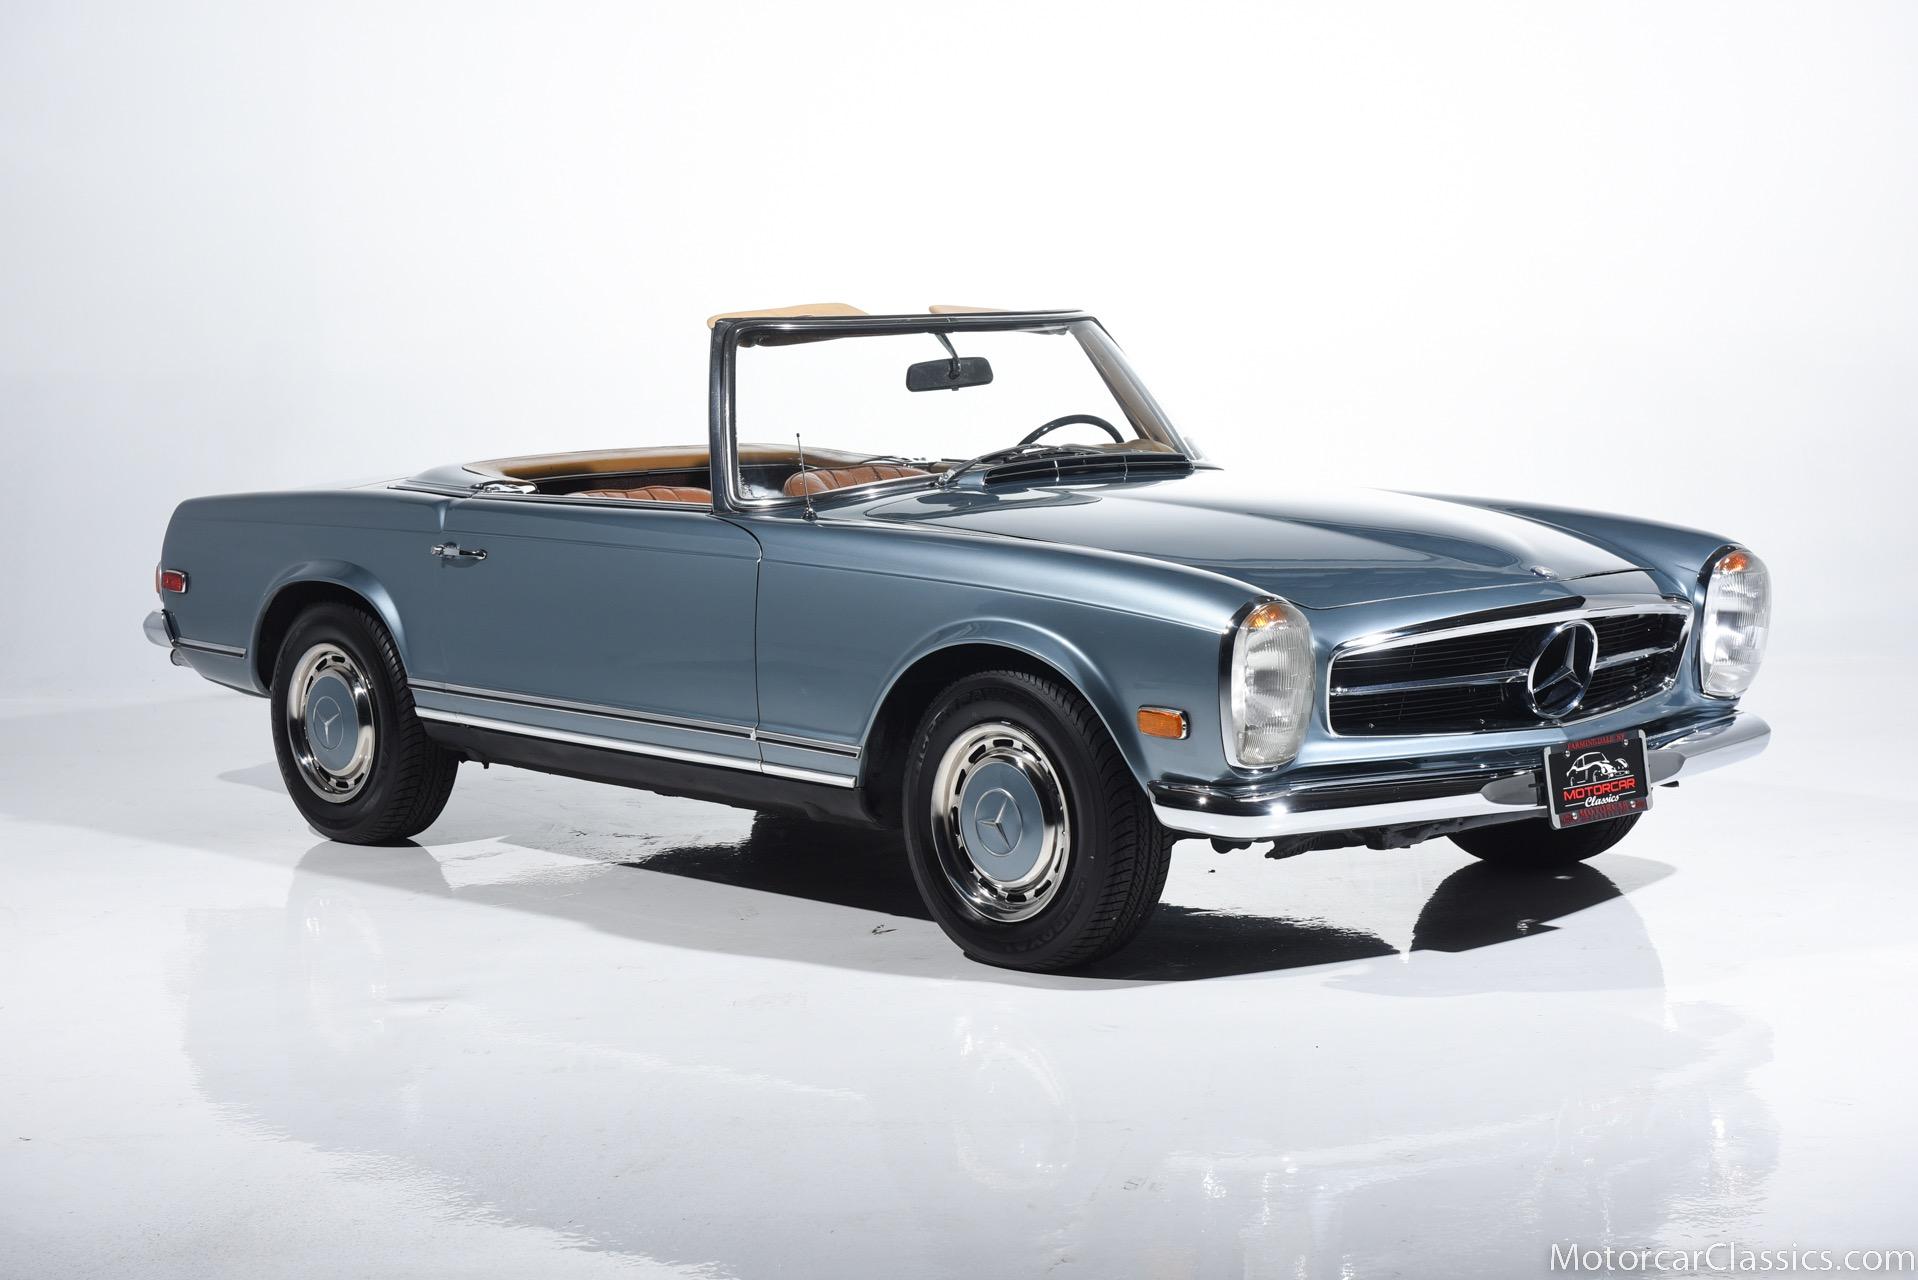 Used 1969 Mercedes Benz 280sl For Sale 99 900 Motorcar Classics